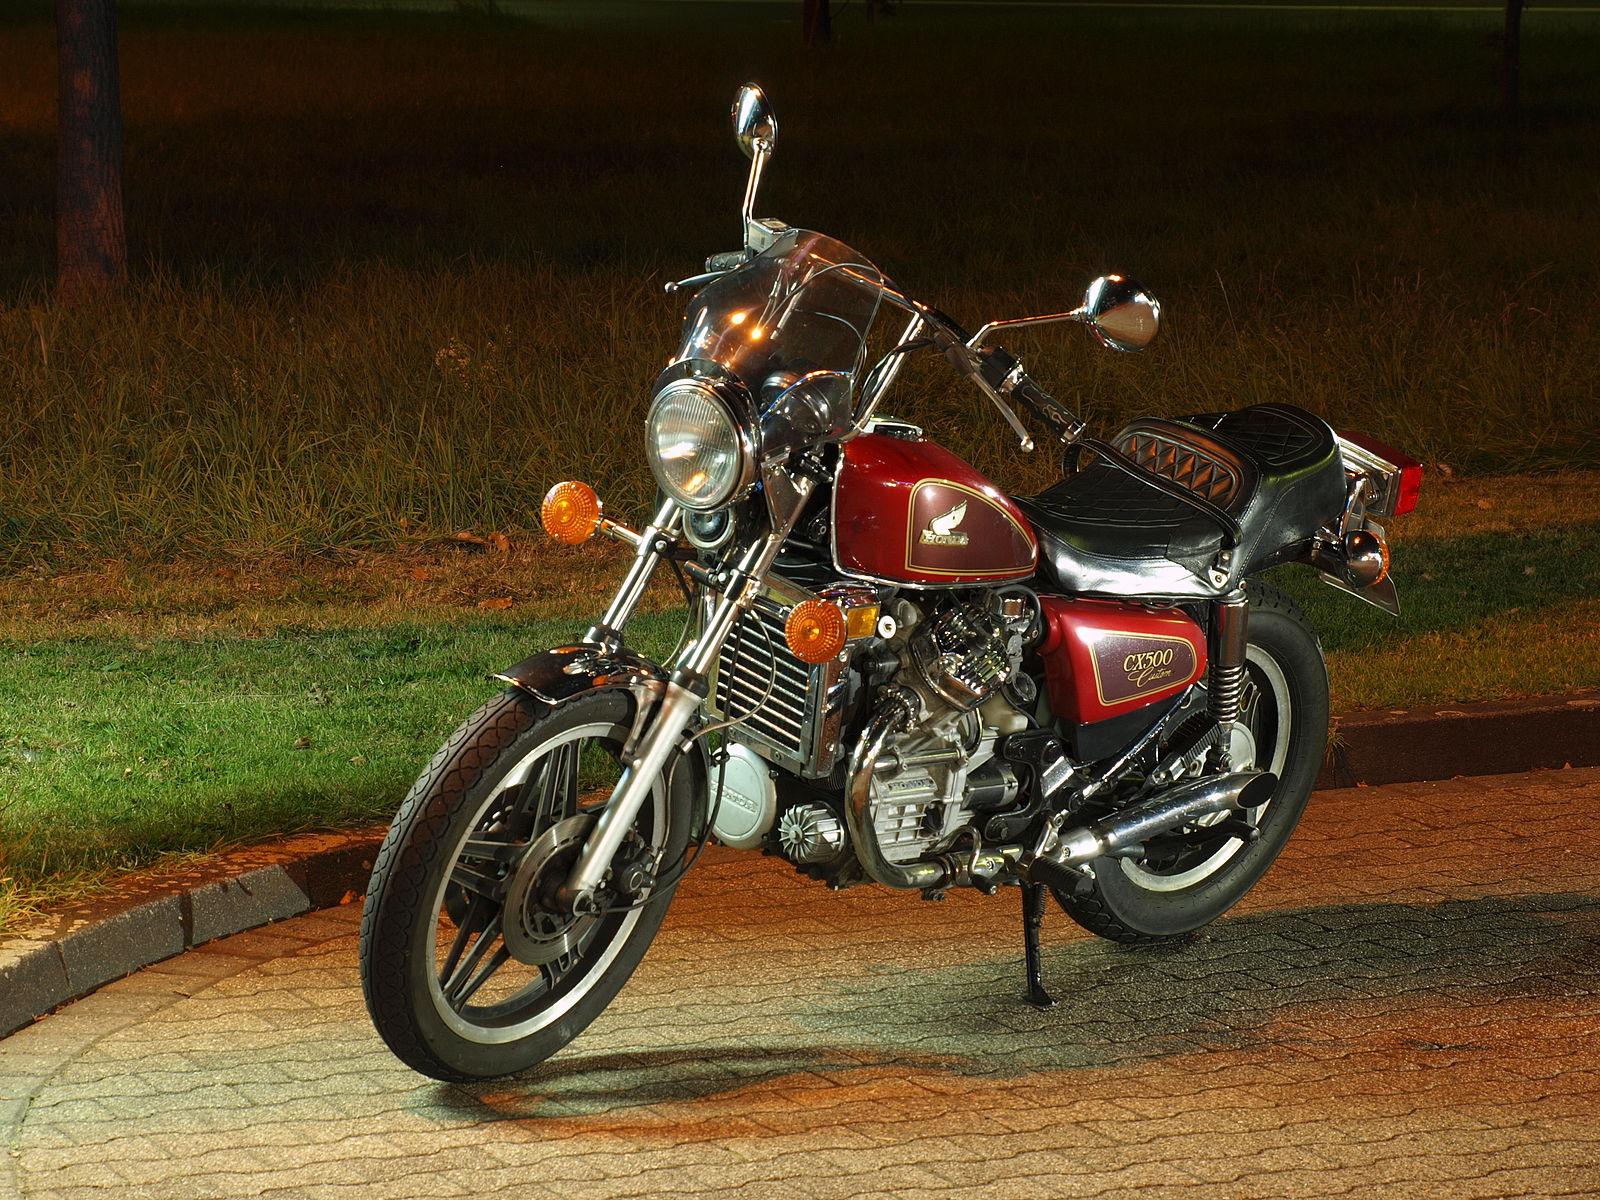 Datei:Honda CX 500 C.JPG - Wikipedia